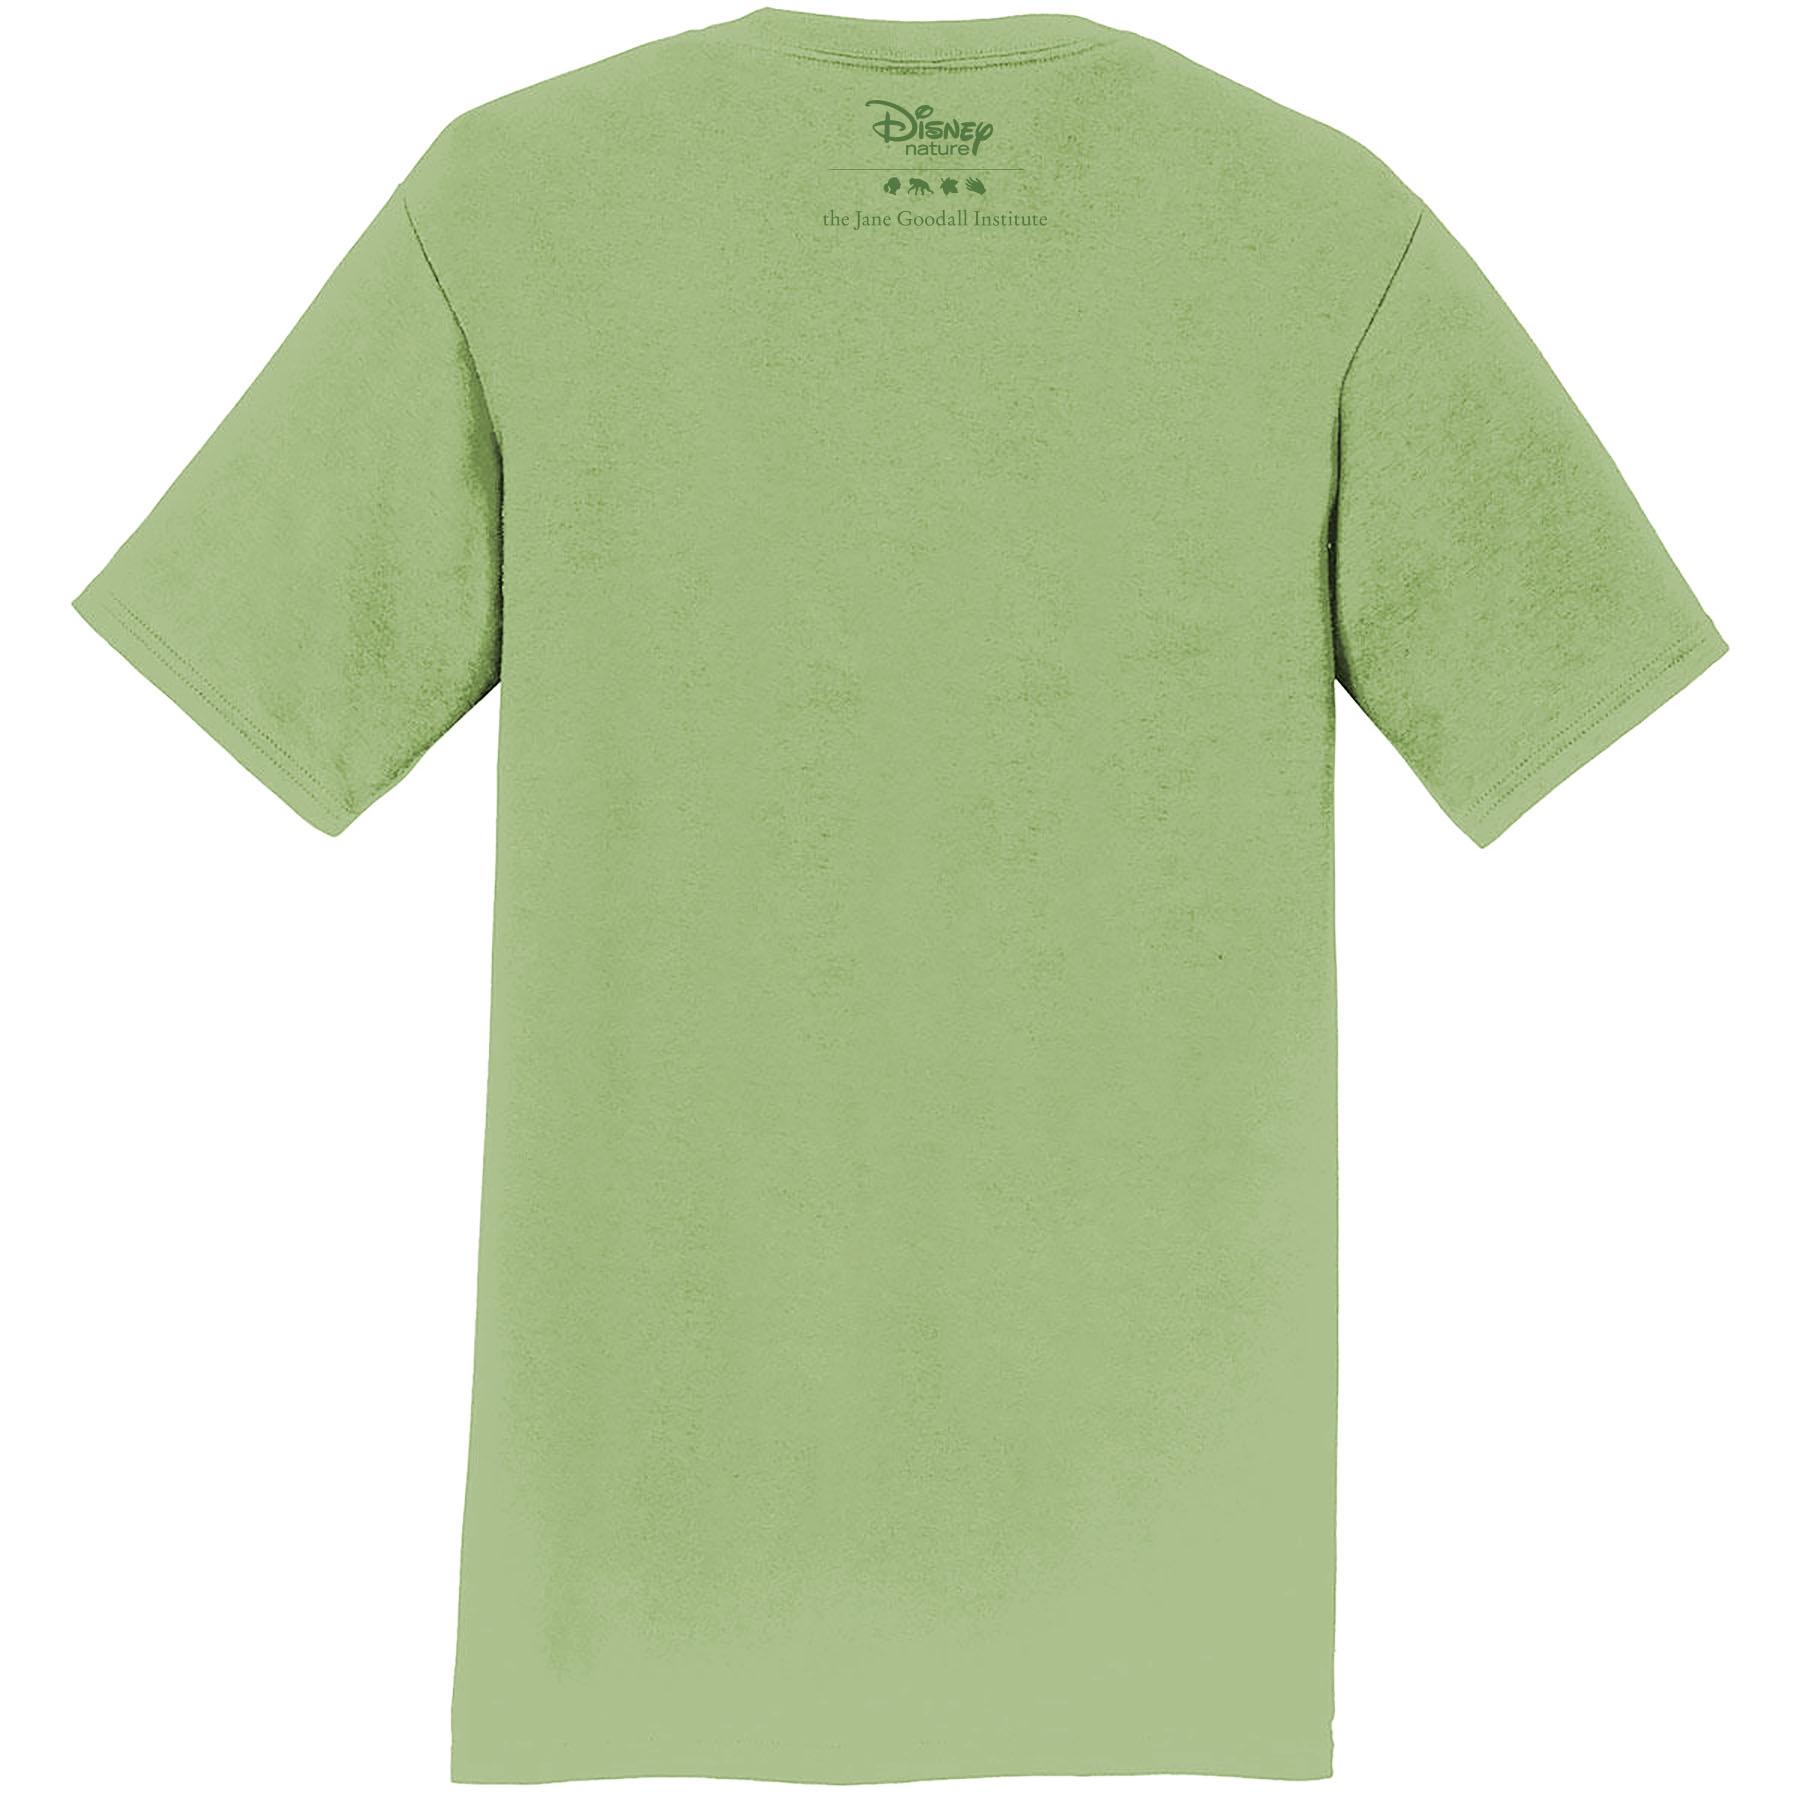 Disneynature + JGI  Oscar & Jane Goodall Quote Youth T-Shirt  - JGI221